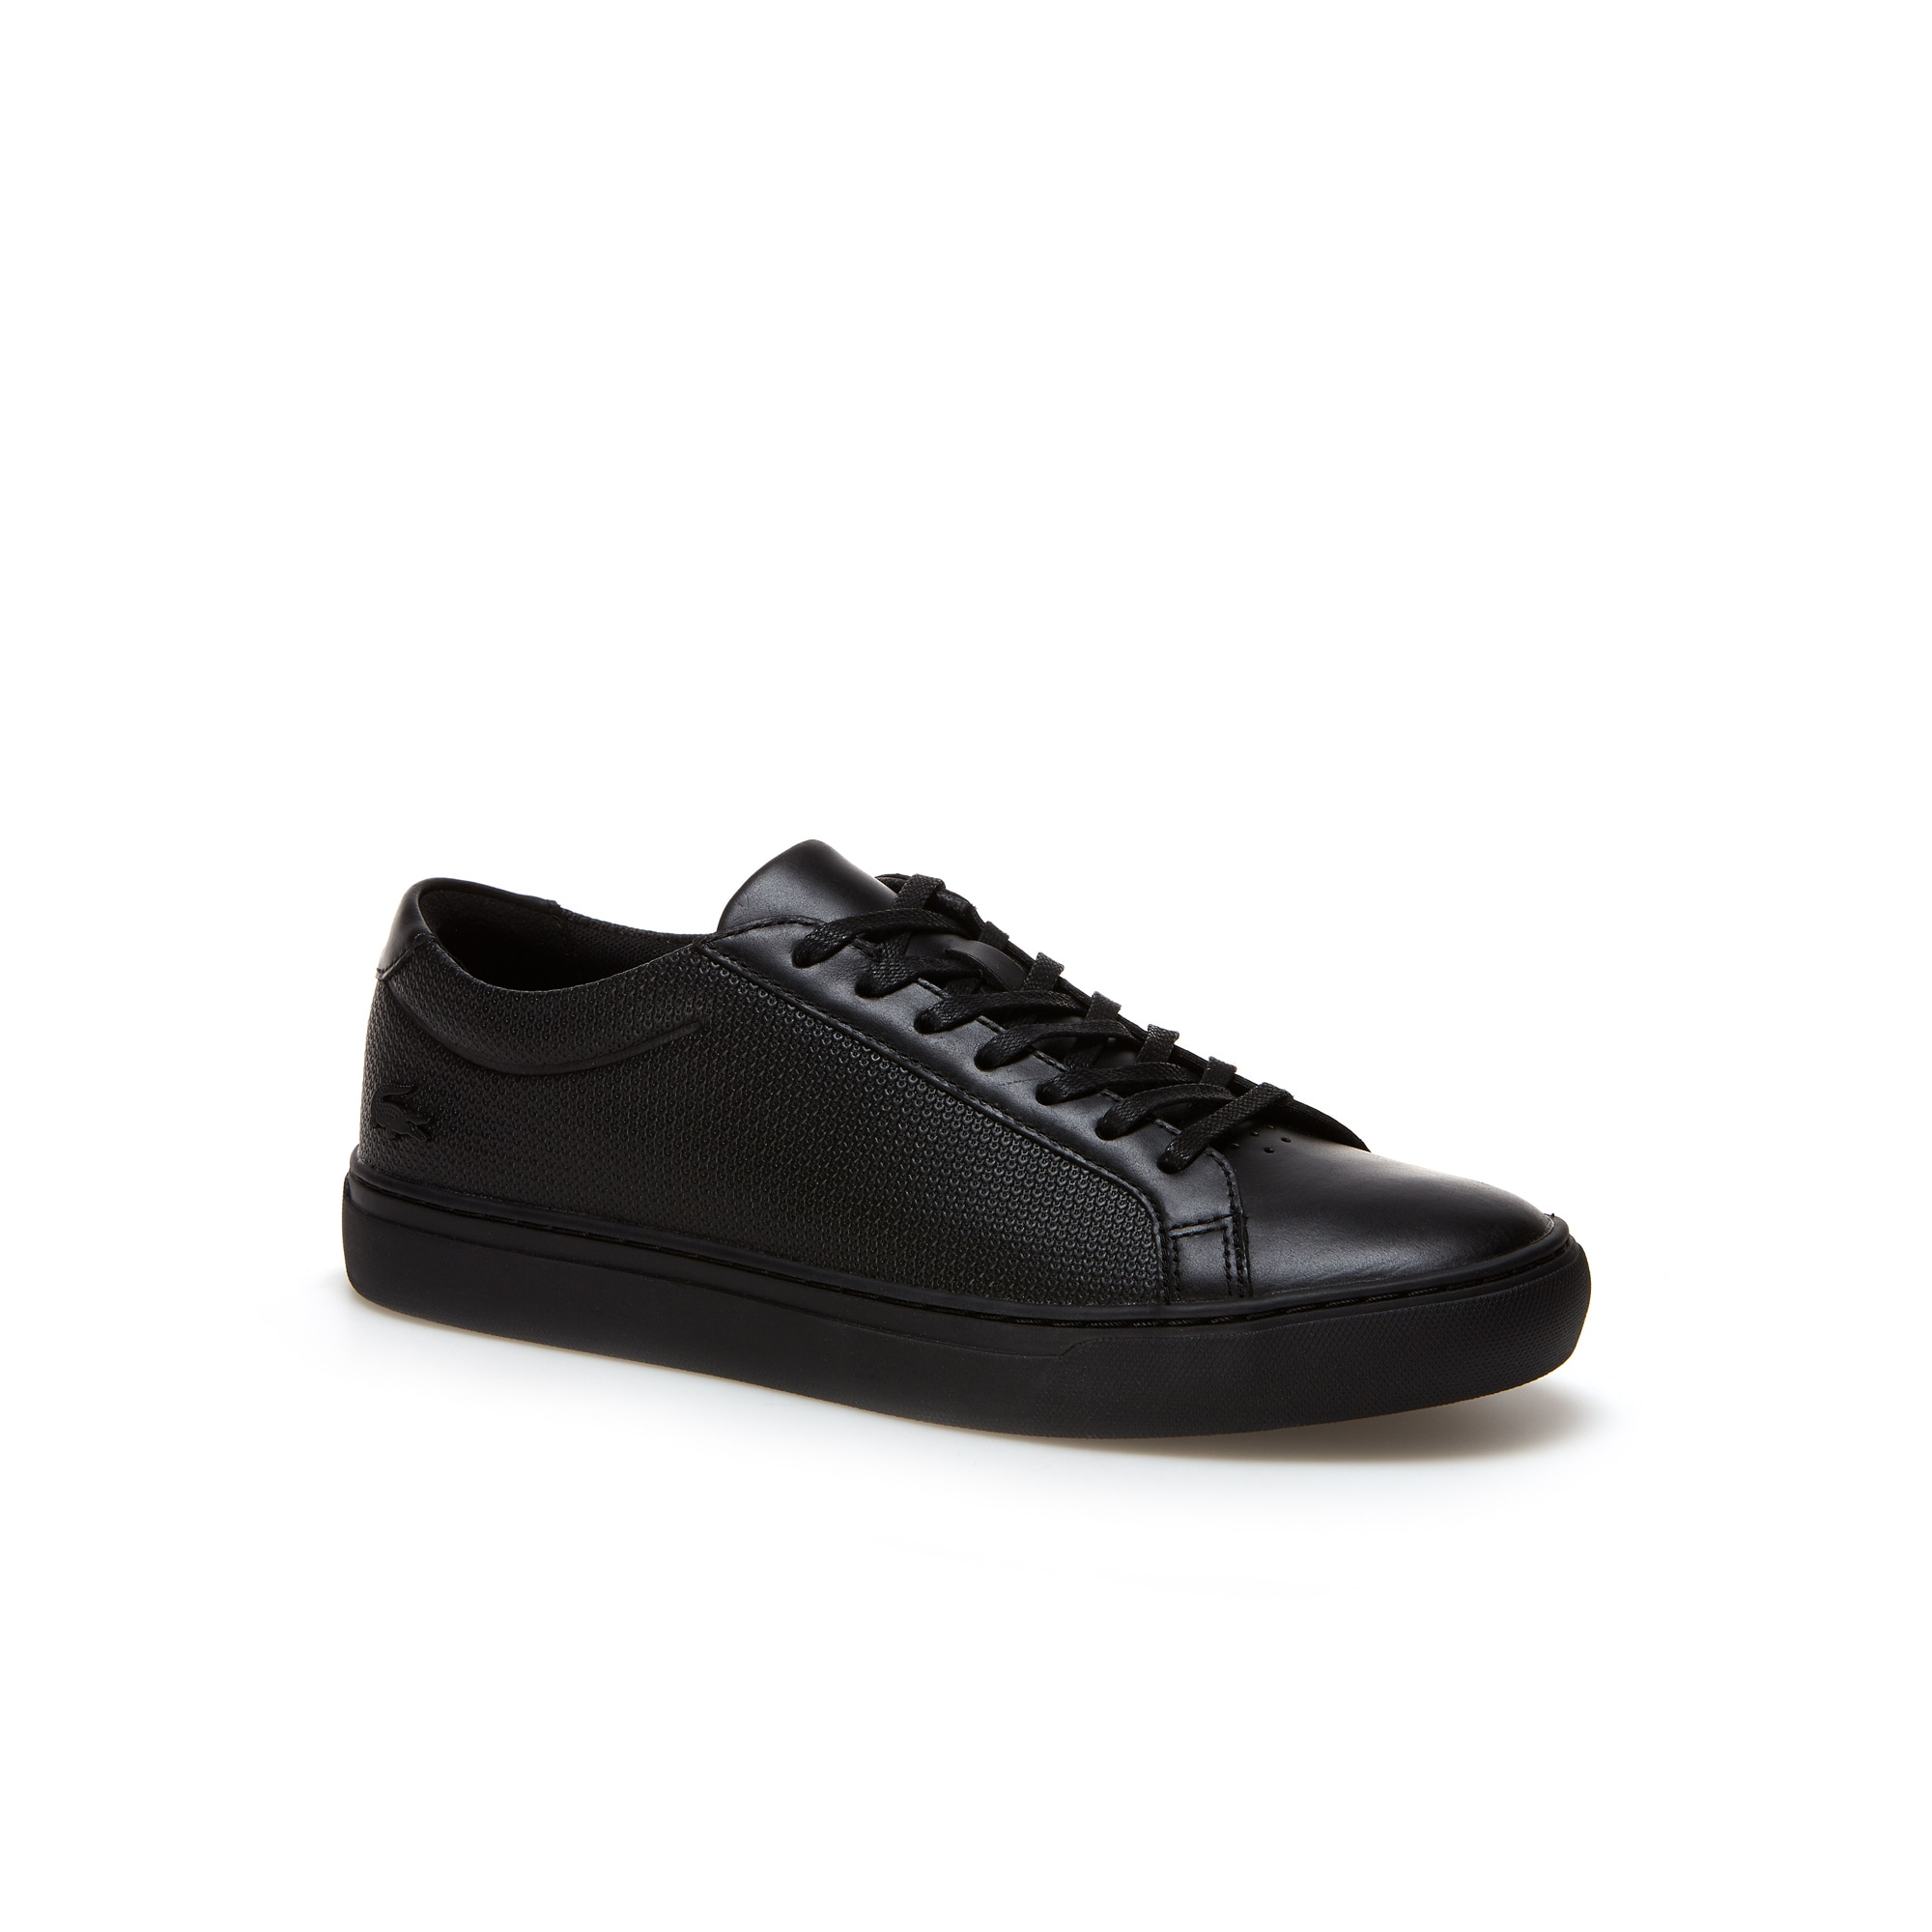 Sneakers L.12.12 in pelle